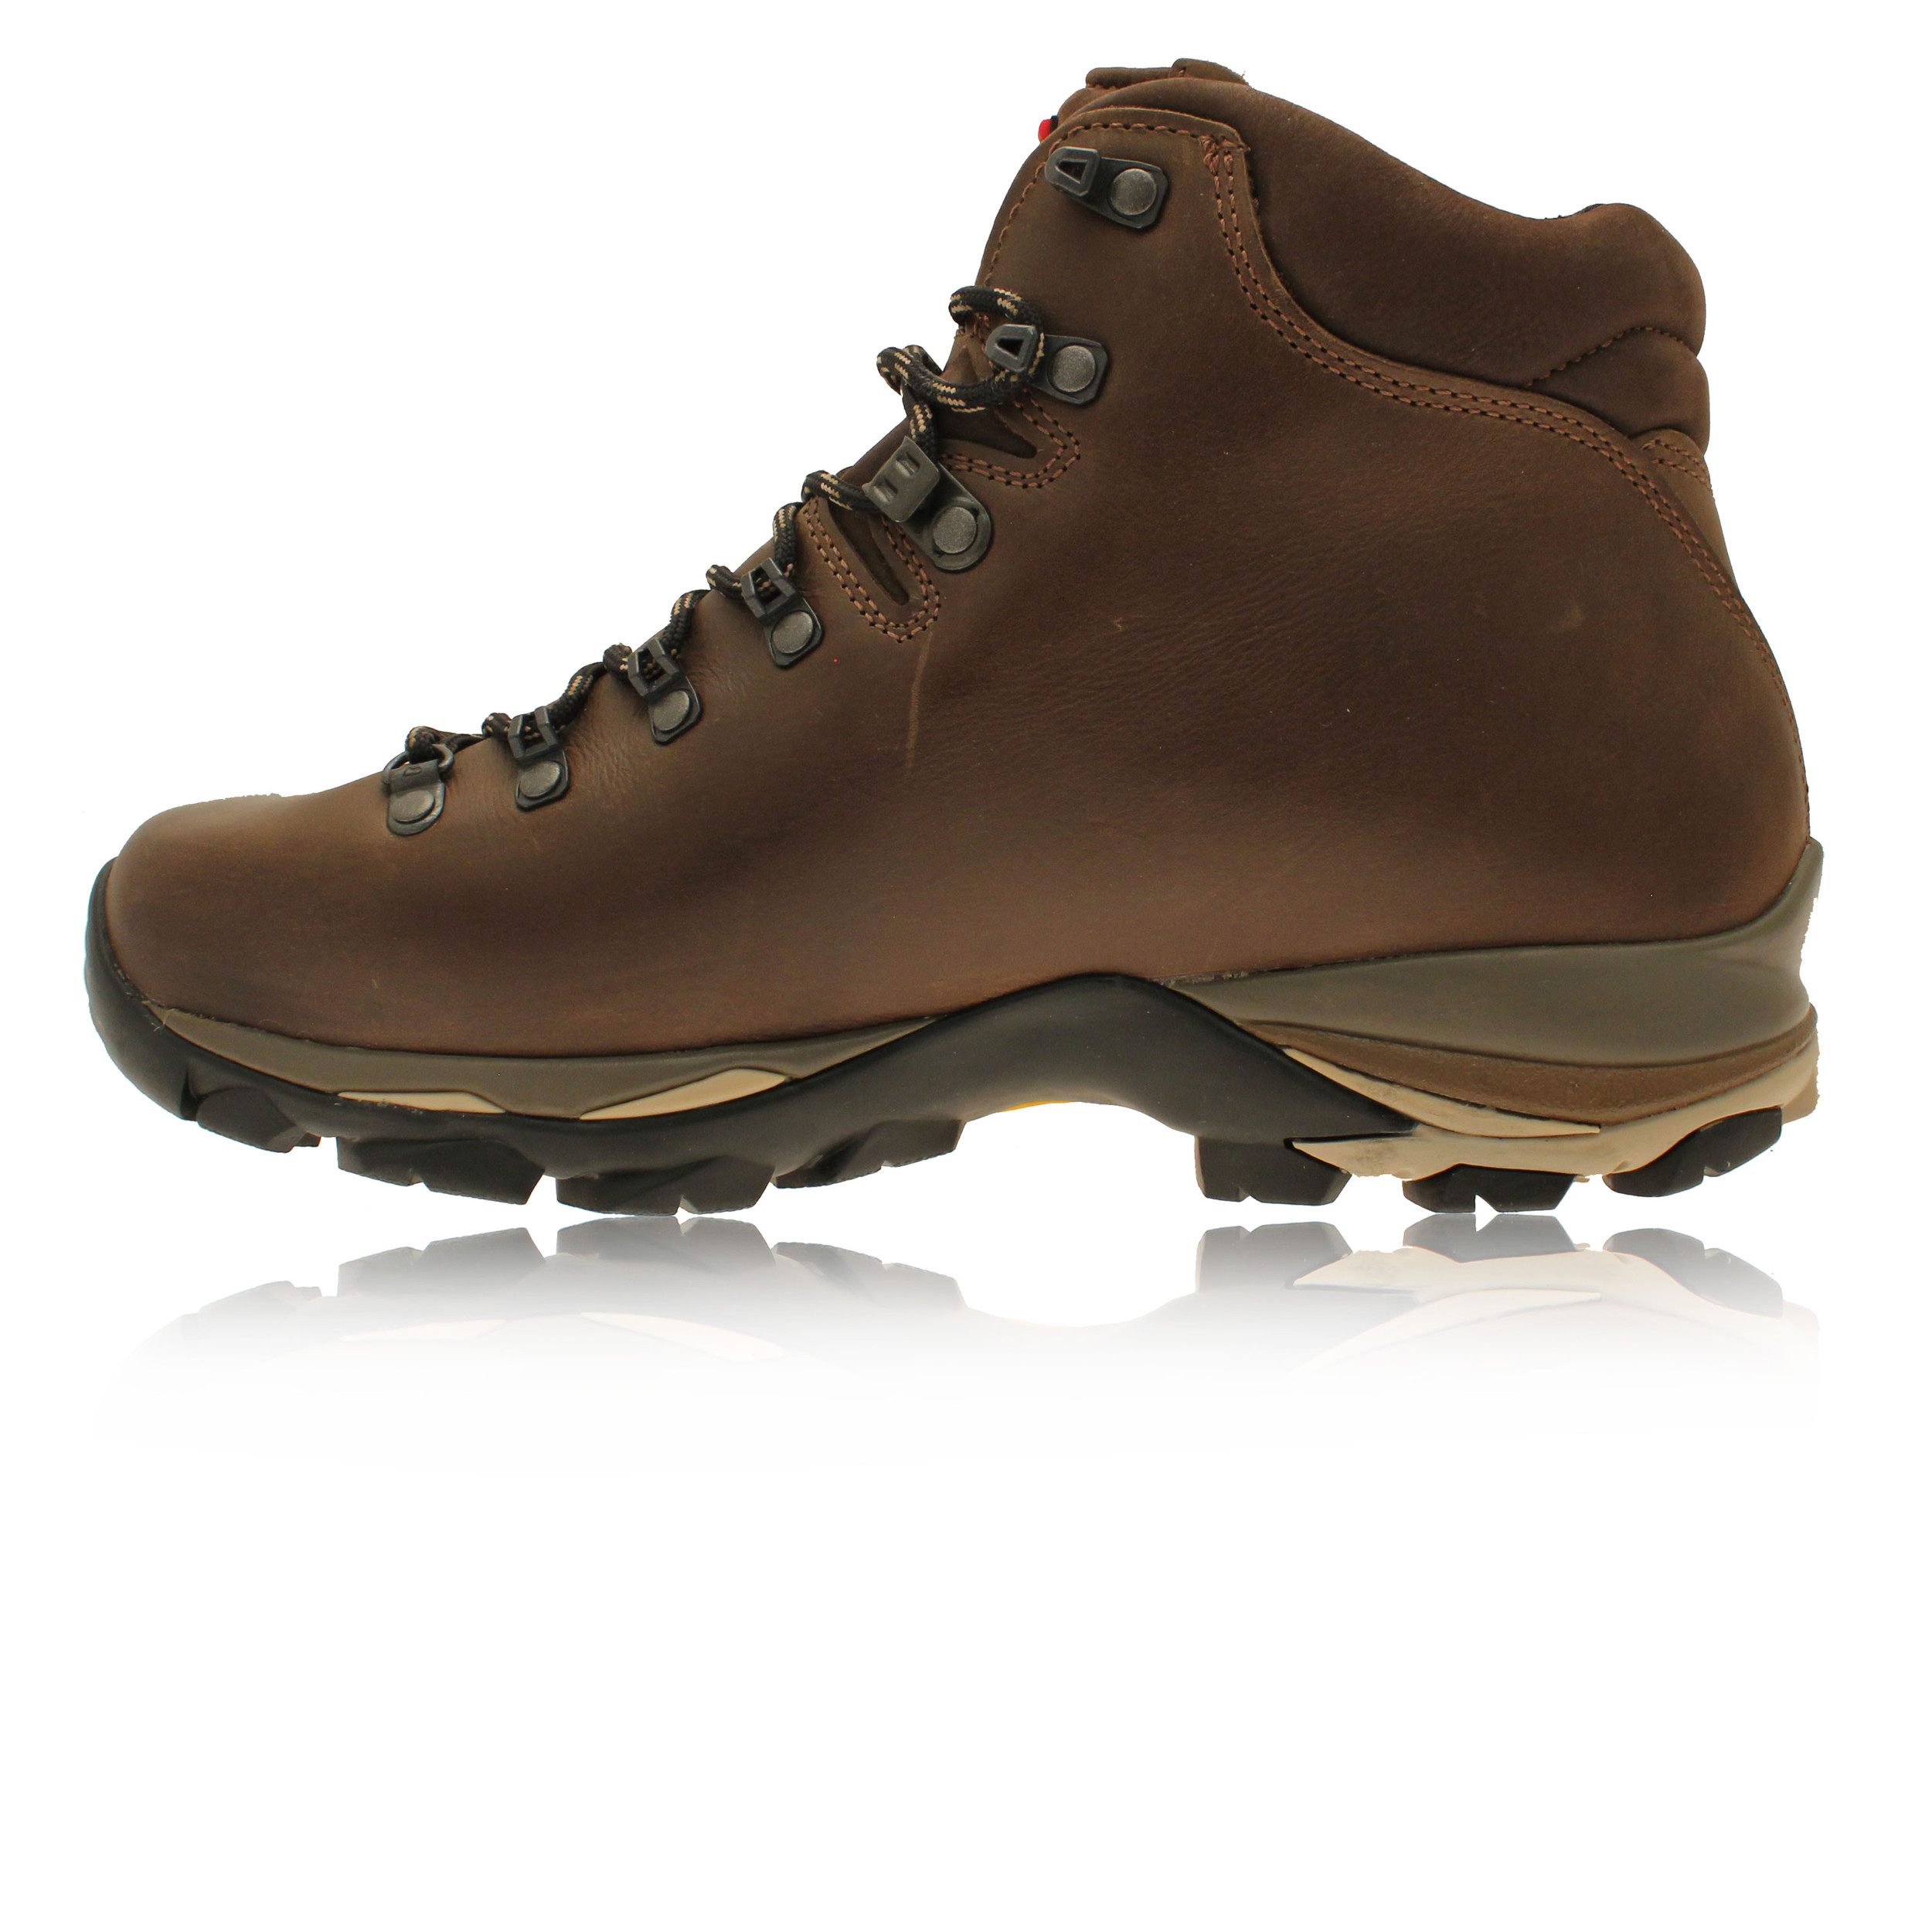 Zamberlan-313-Vioz-Lite-Mens-Brown-Gore-Tex-